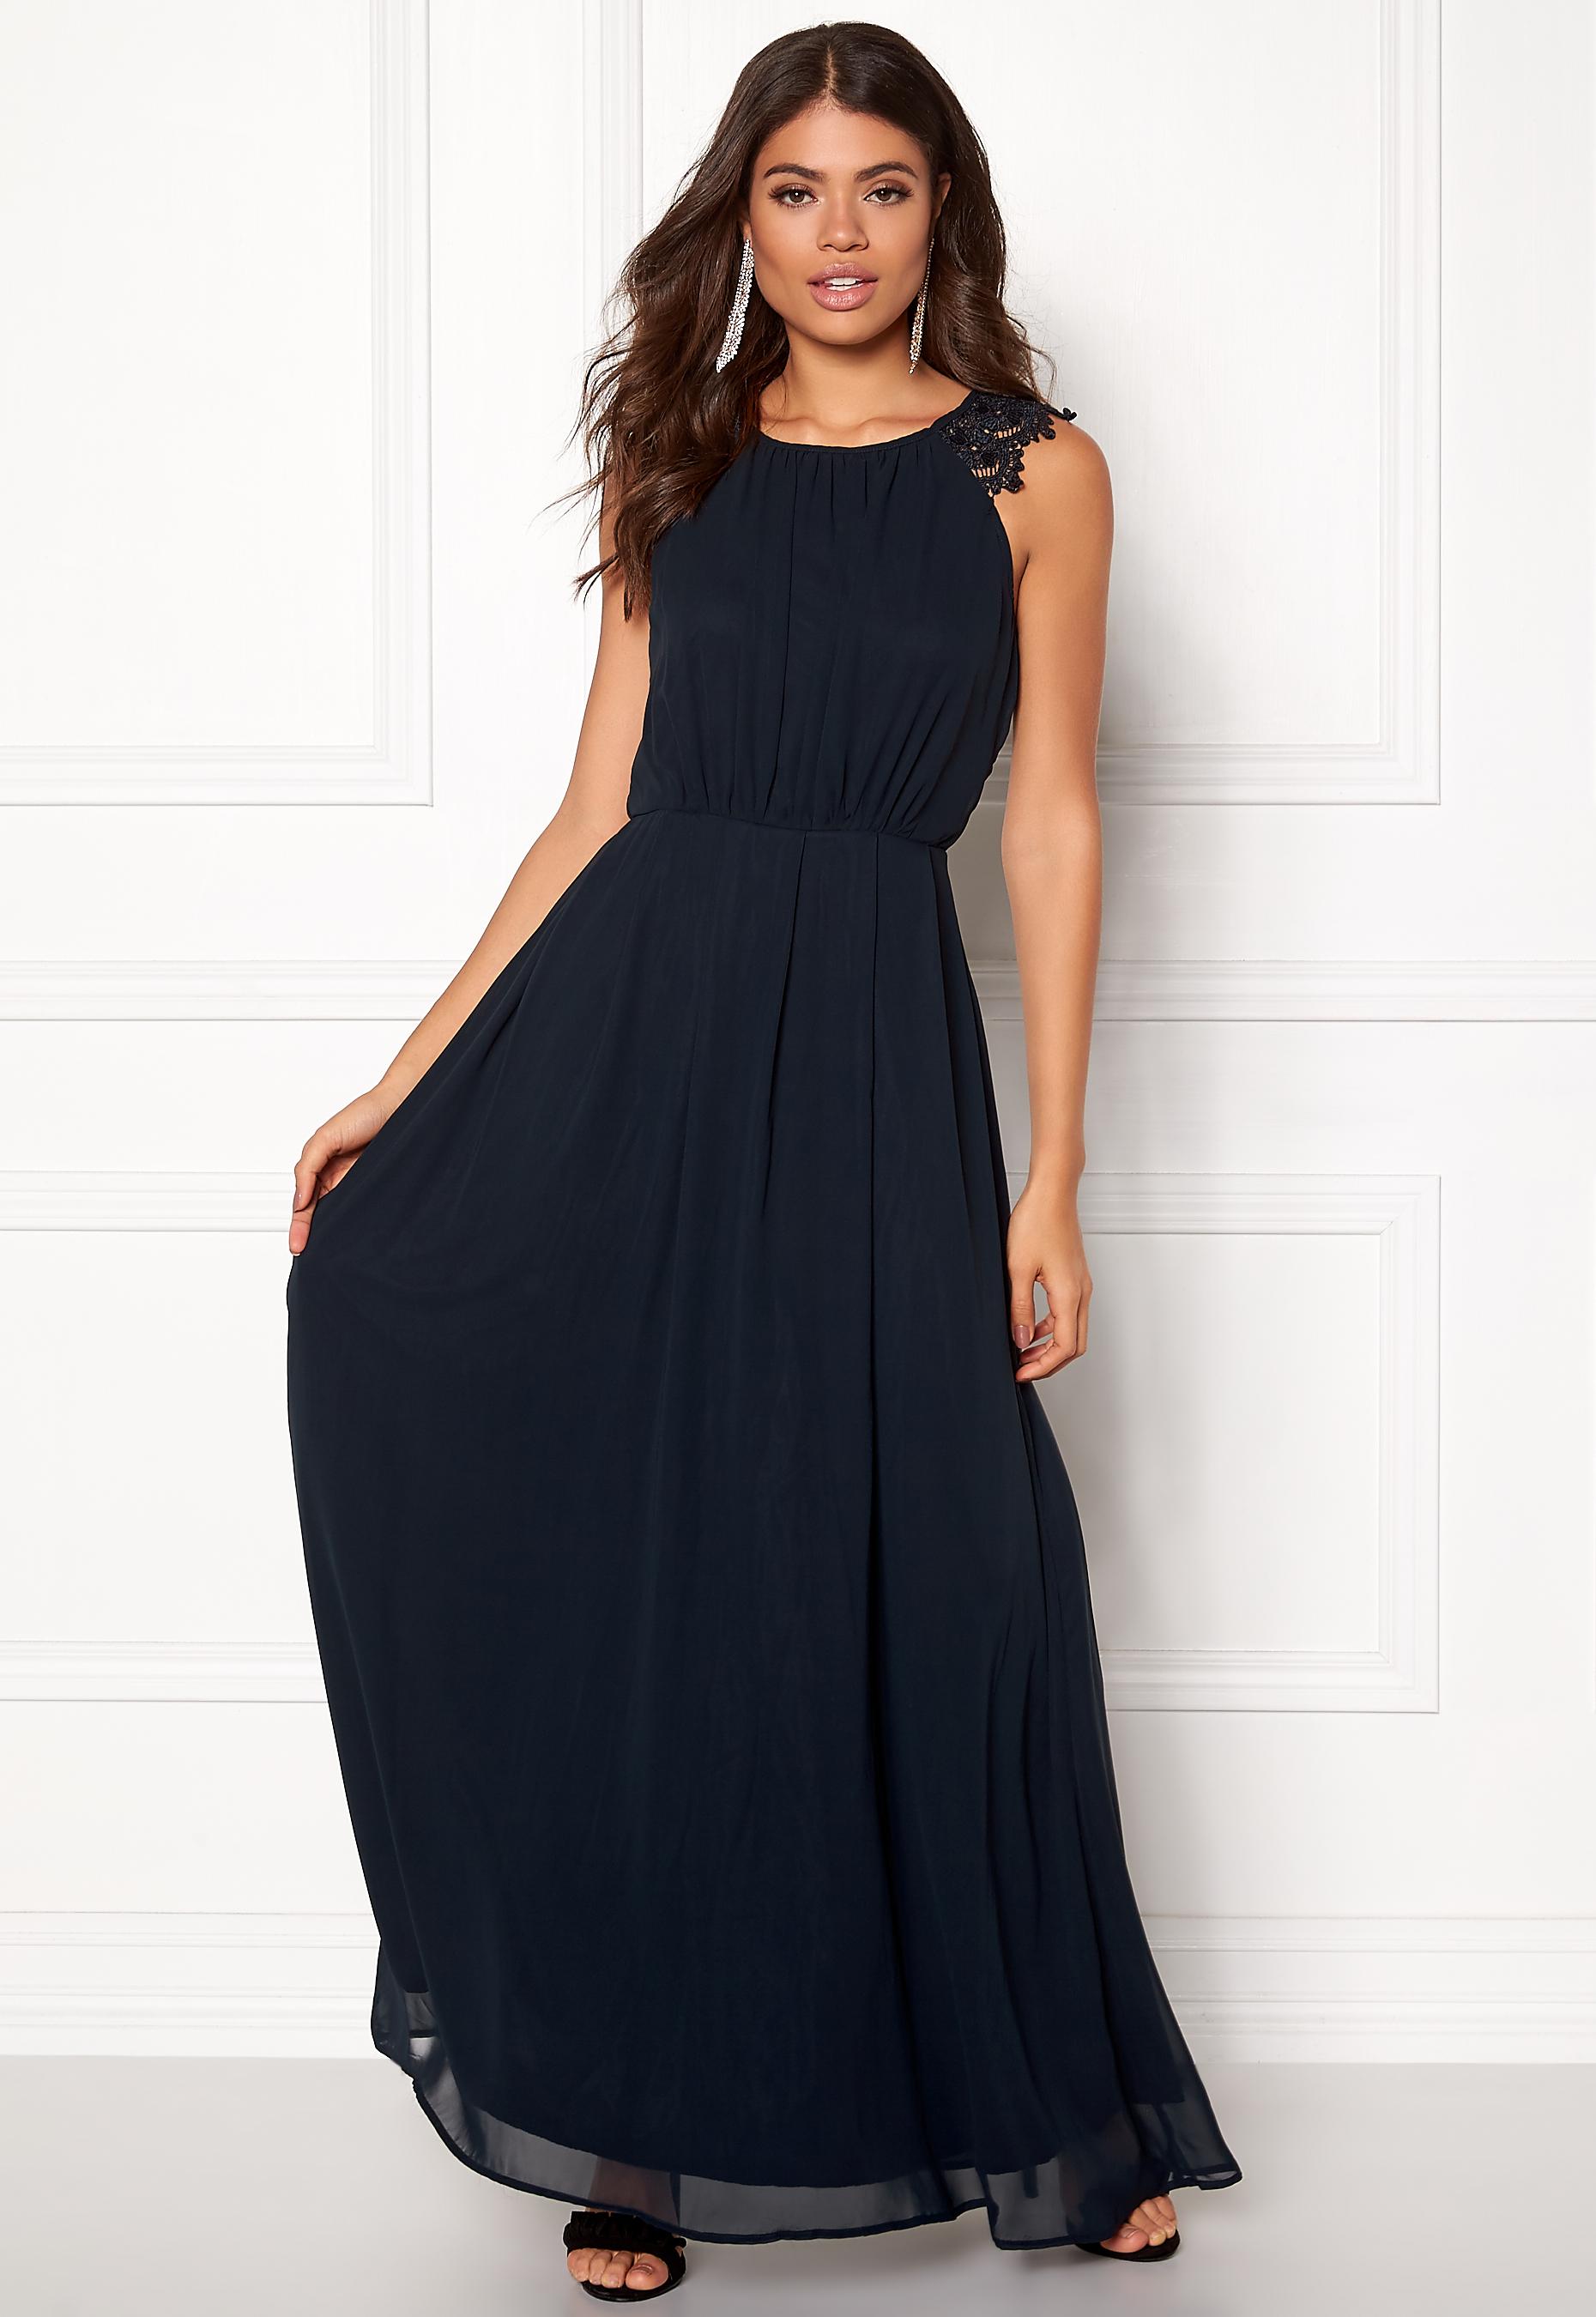 AX Paris Lace Trim Chiffon Maxi Dress Navy Bubbleroom.se 324edccfb7a52